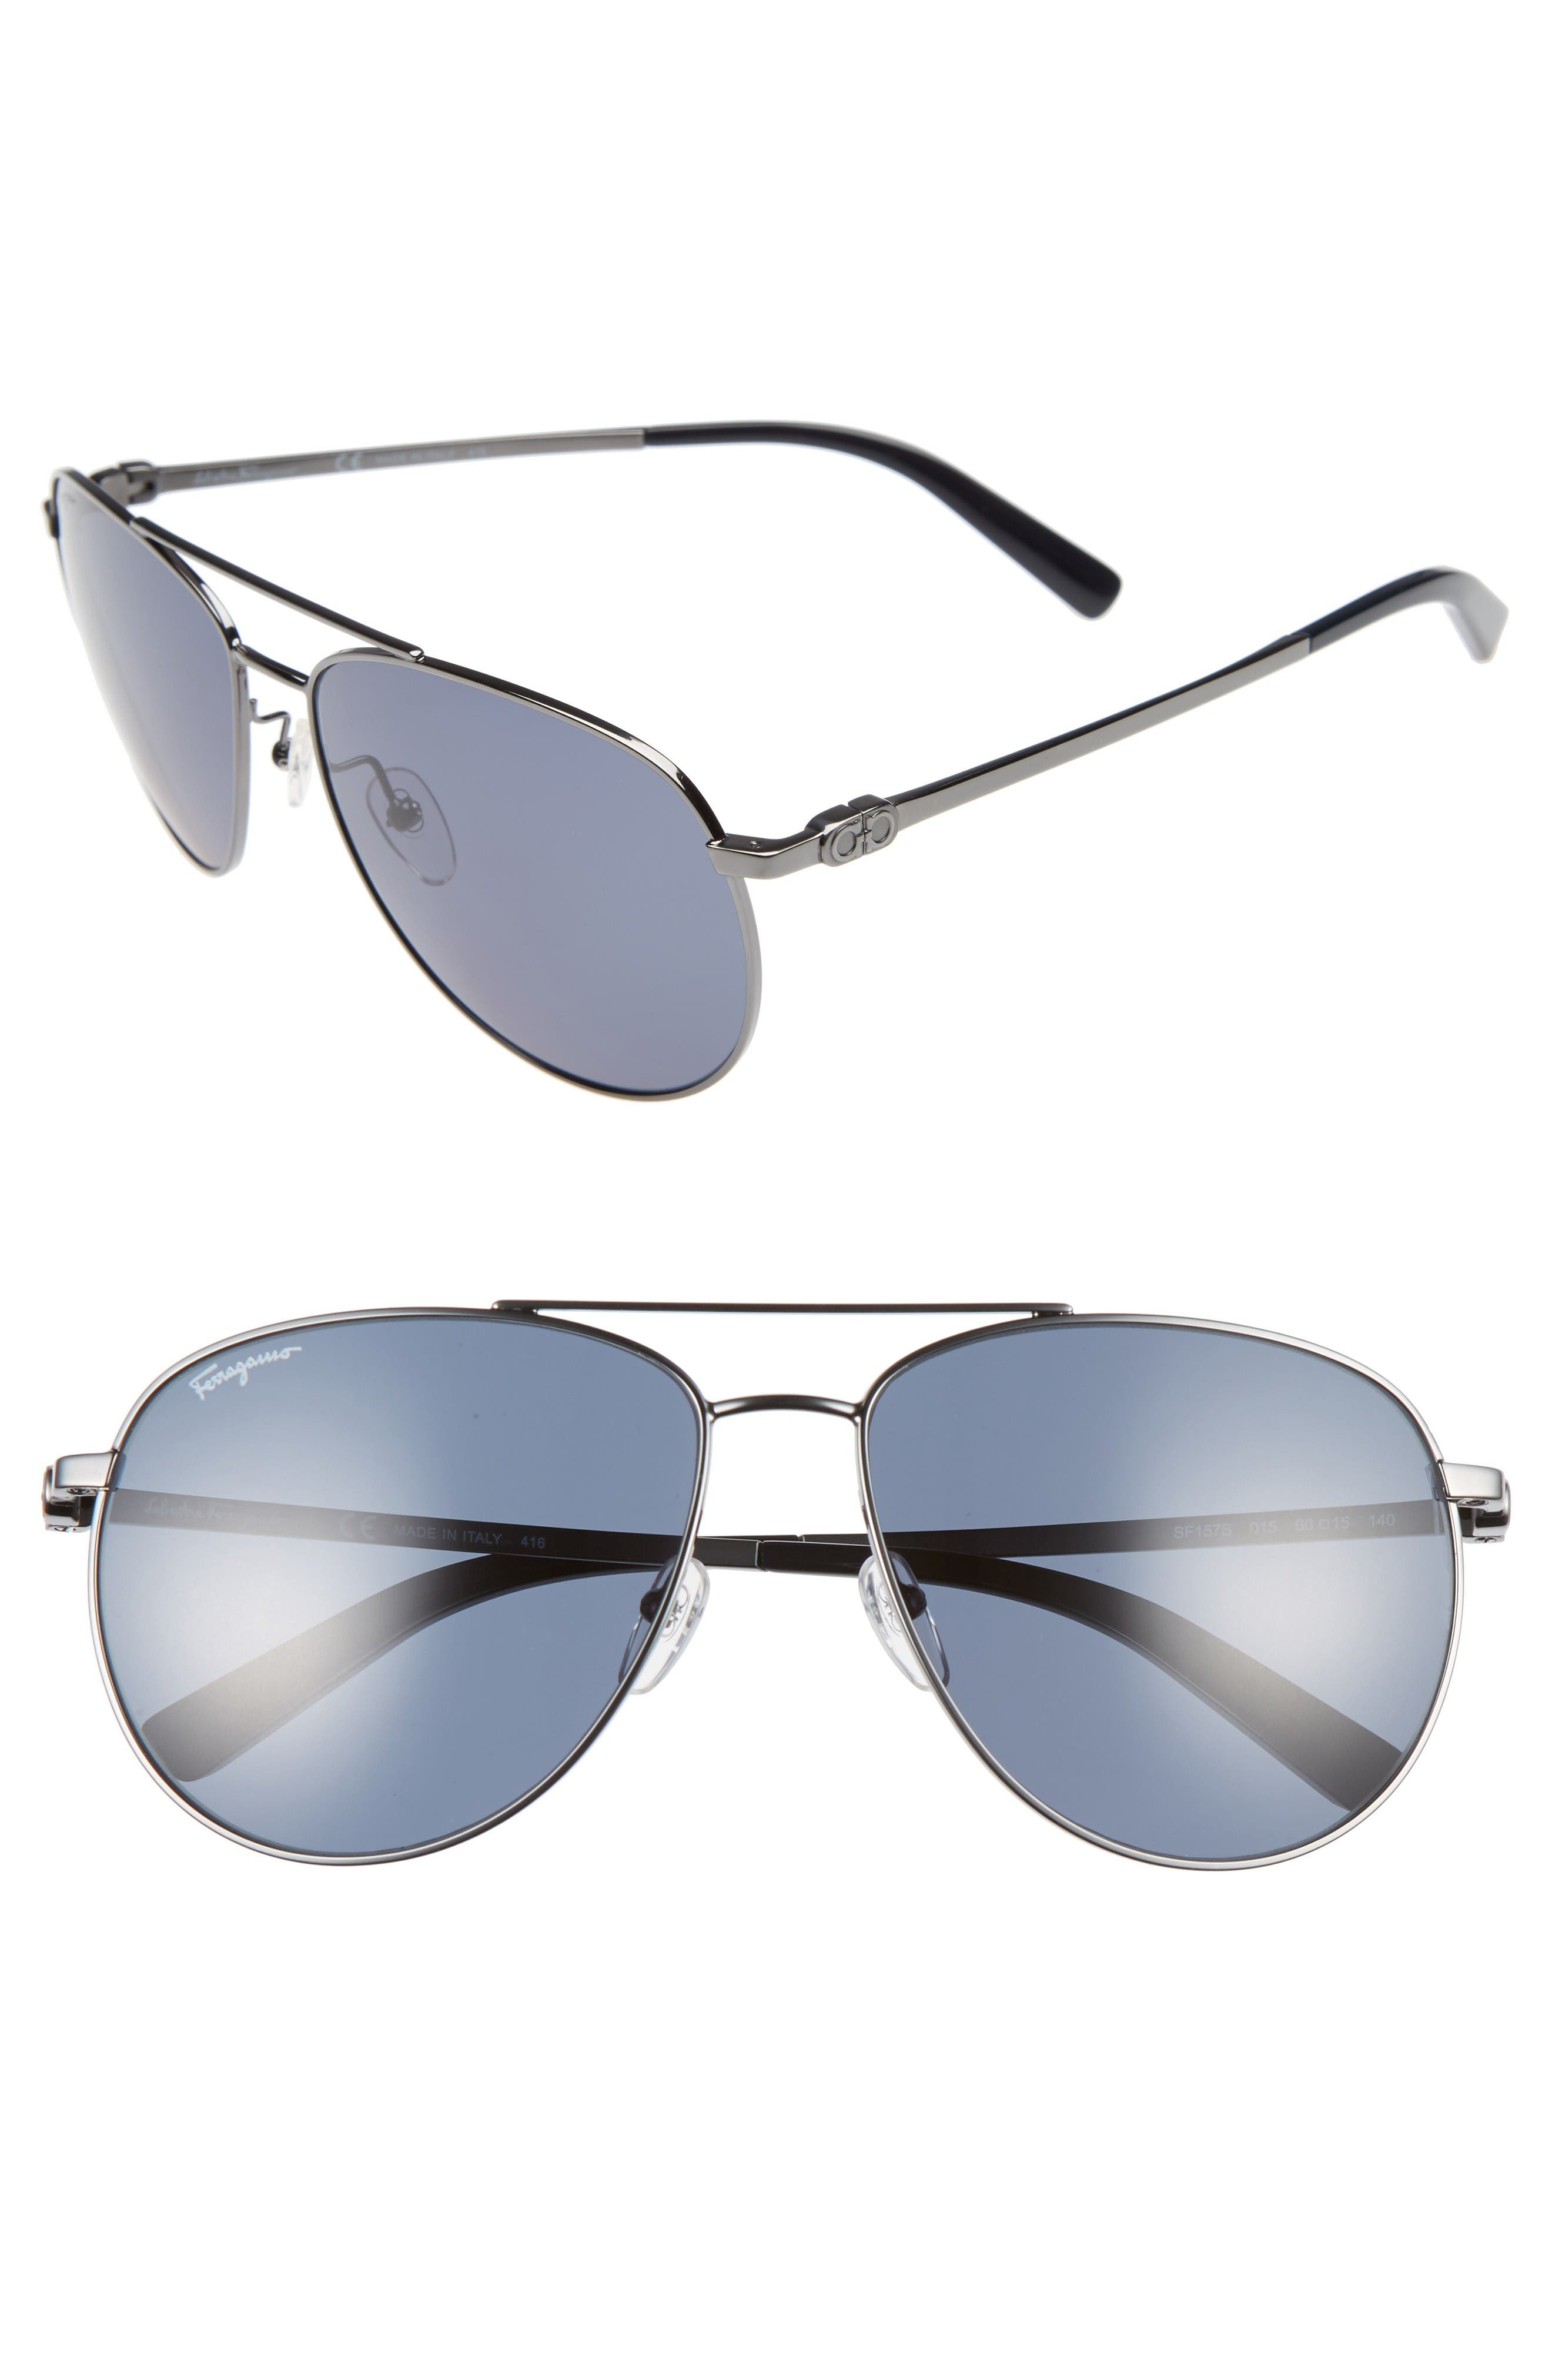 Gancio 60mm Aviator Sunglasses,                         Main,                         color, Dark Gunmetal